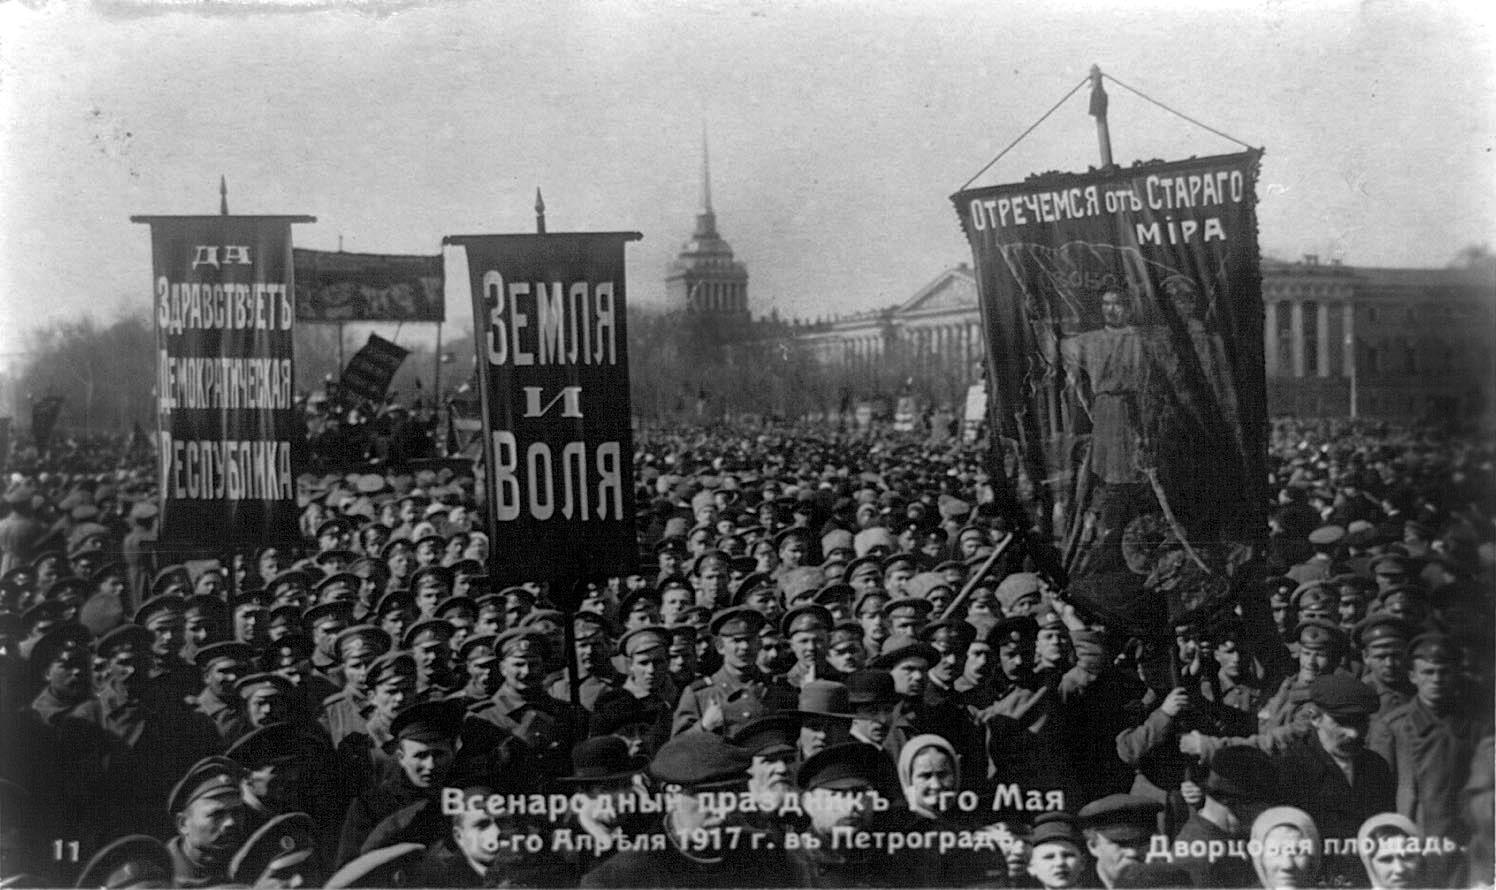 May Day 1917 petrograd